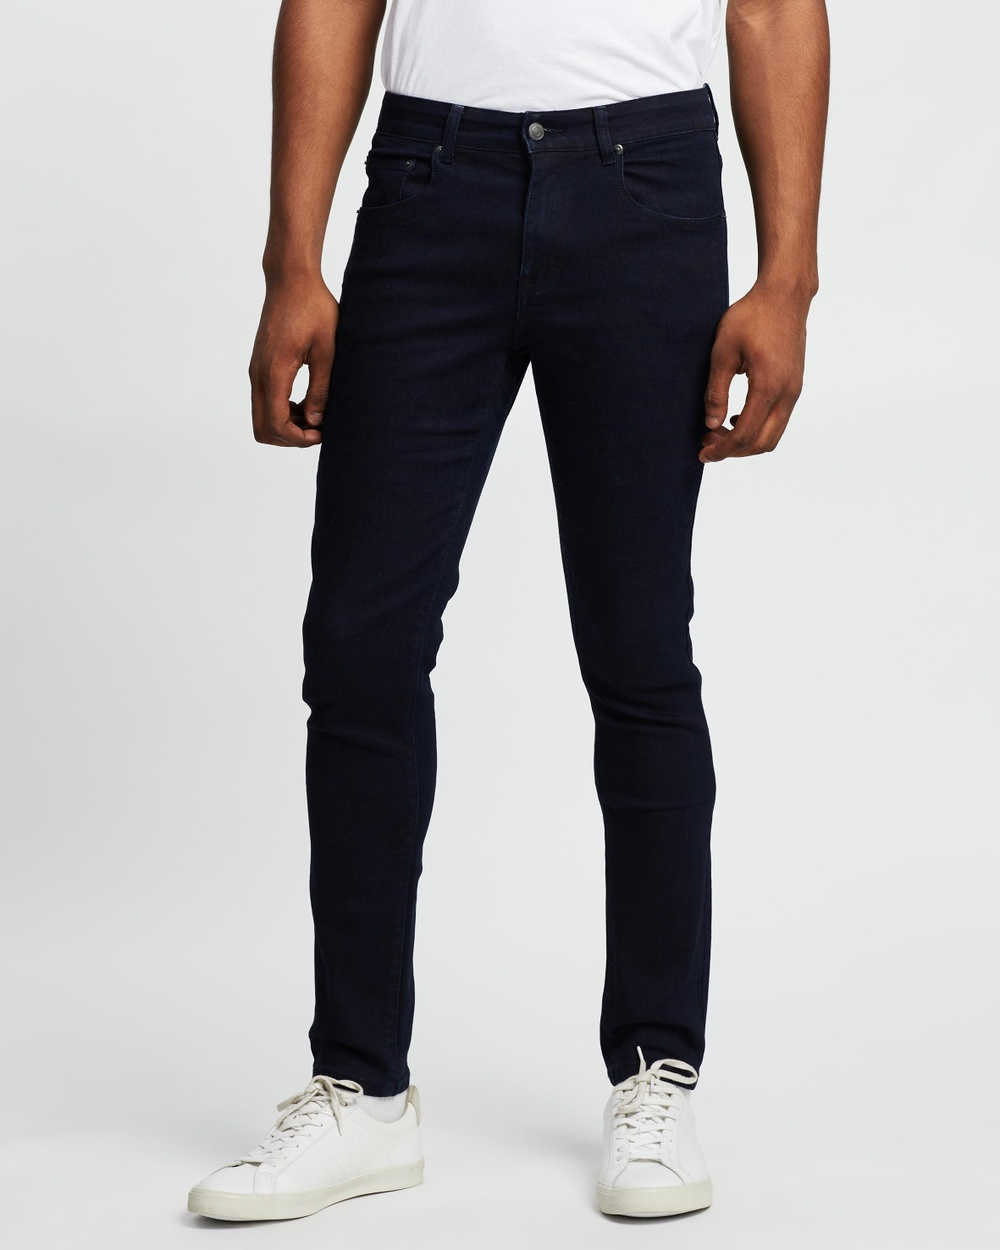 Staple Superior Slim Jeans Vintage Australia